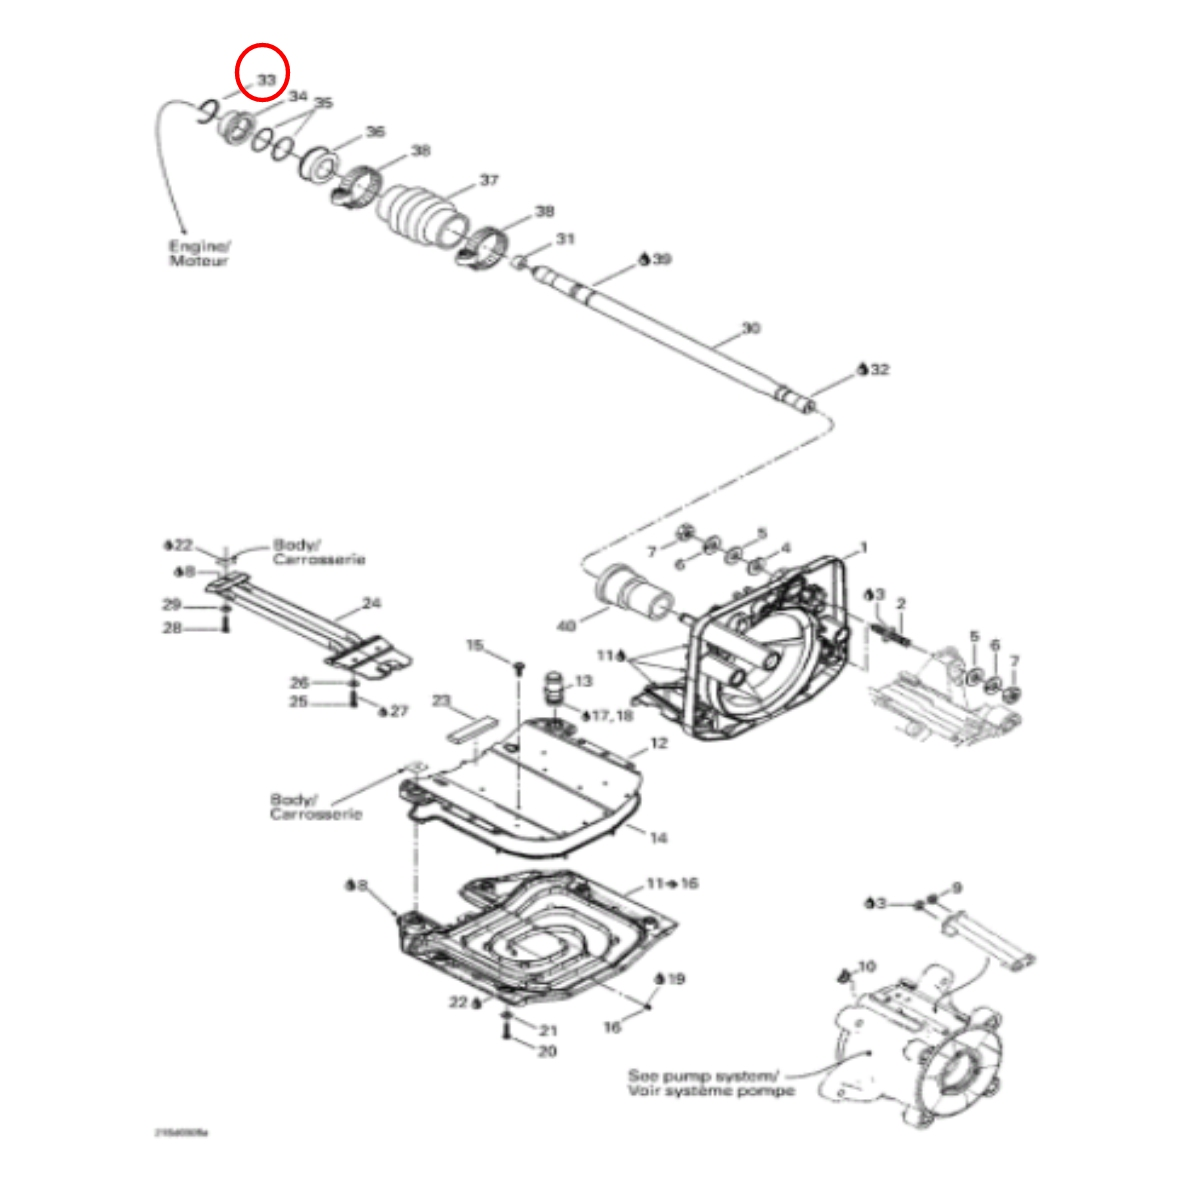 Clip Eixo Transmissão Jet Ski SEADOO GTI,GTX 155 4 TEC  - Radical Peças - Peças para Jet Ski